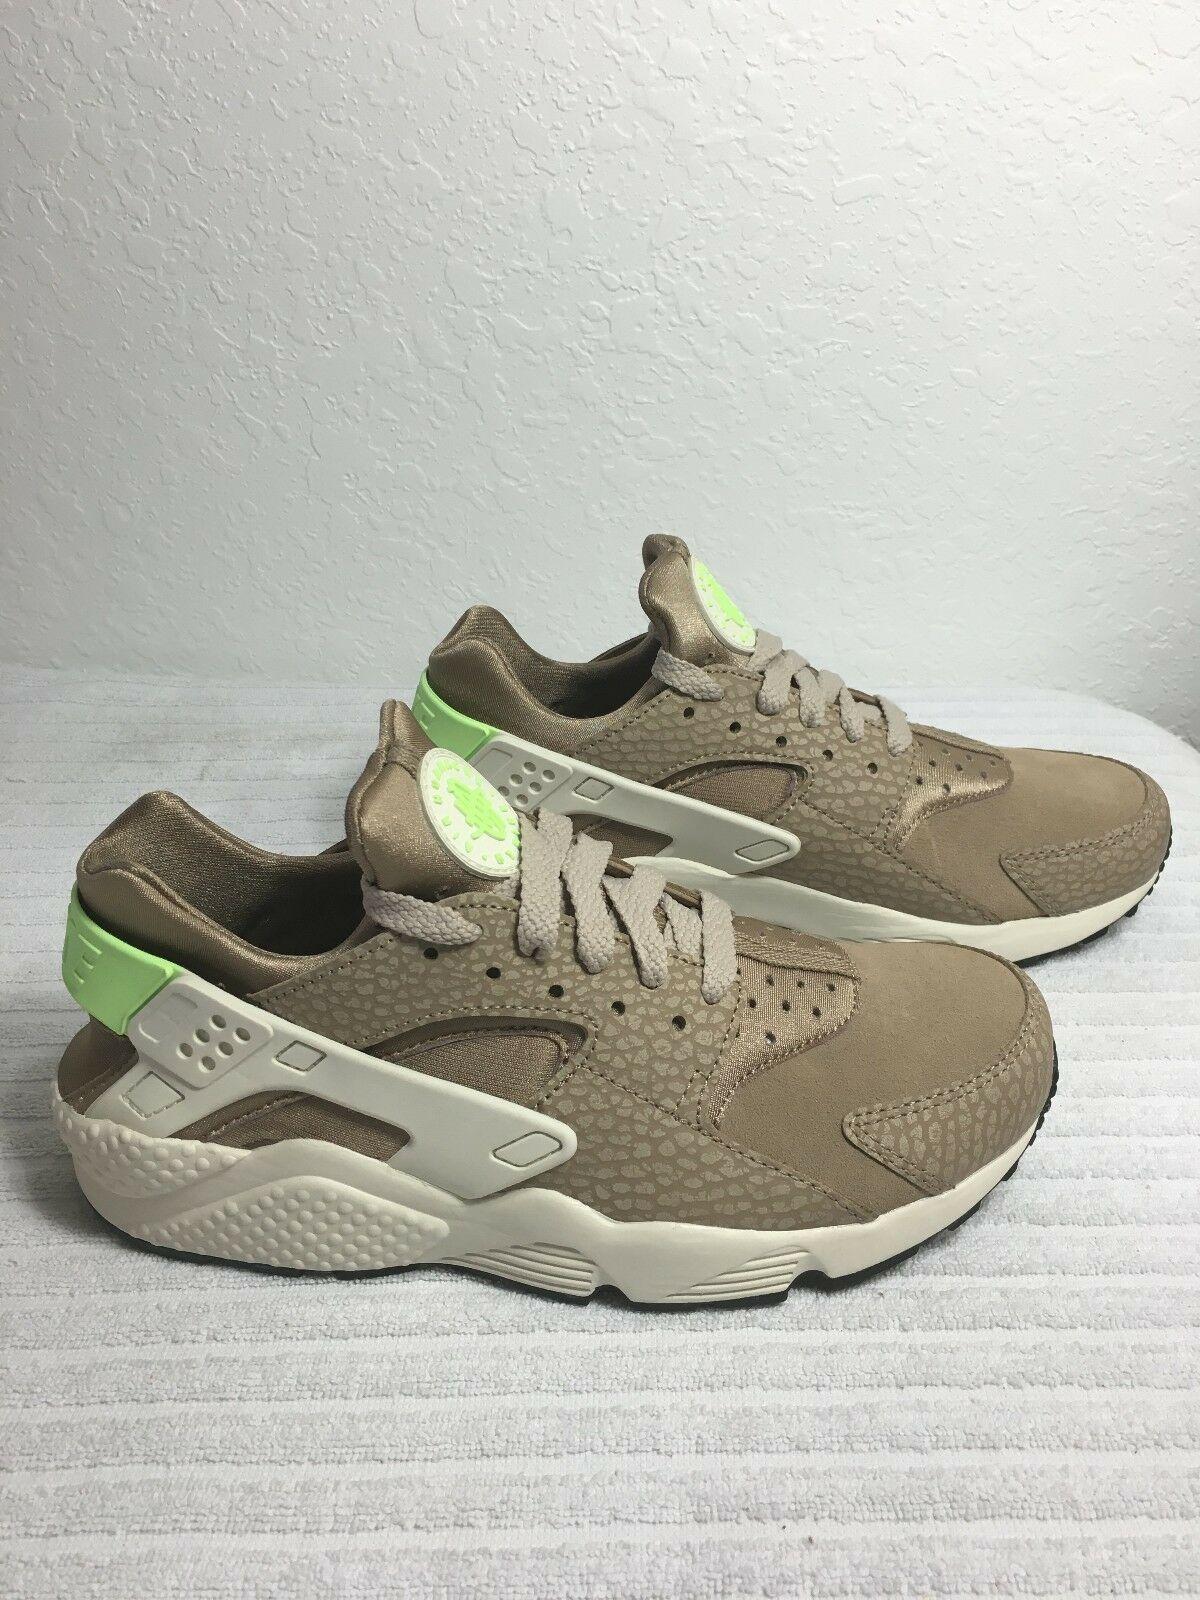 243c217f1fea5 Nike Air Huarache Run Prm Desert CAMO/GREEN and 50 similar items